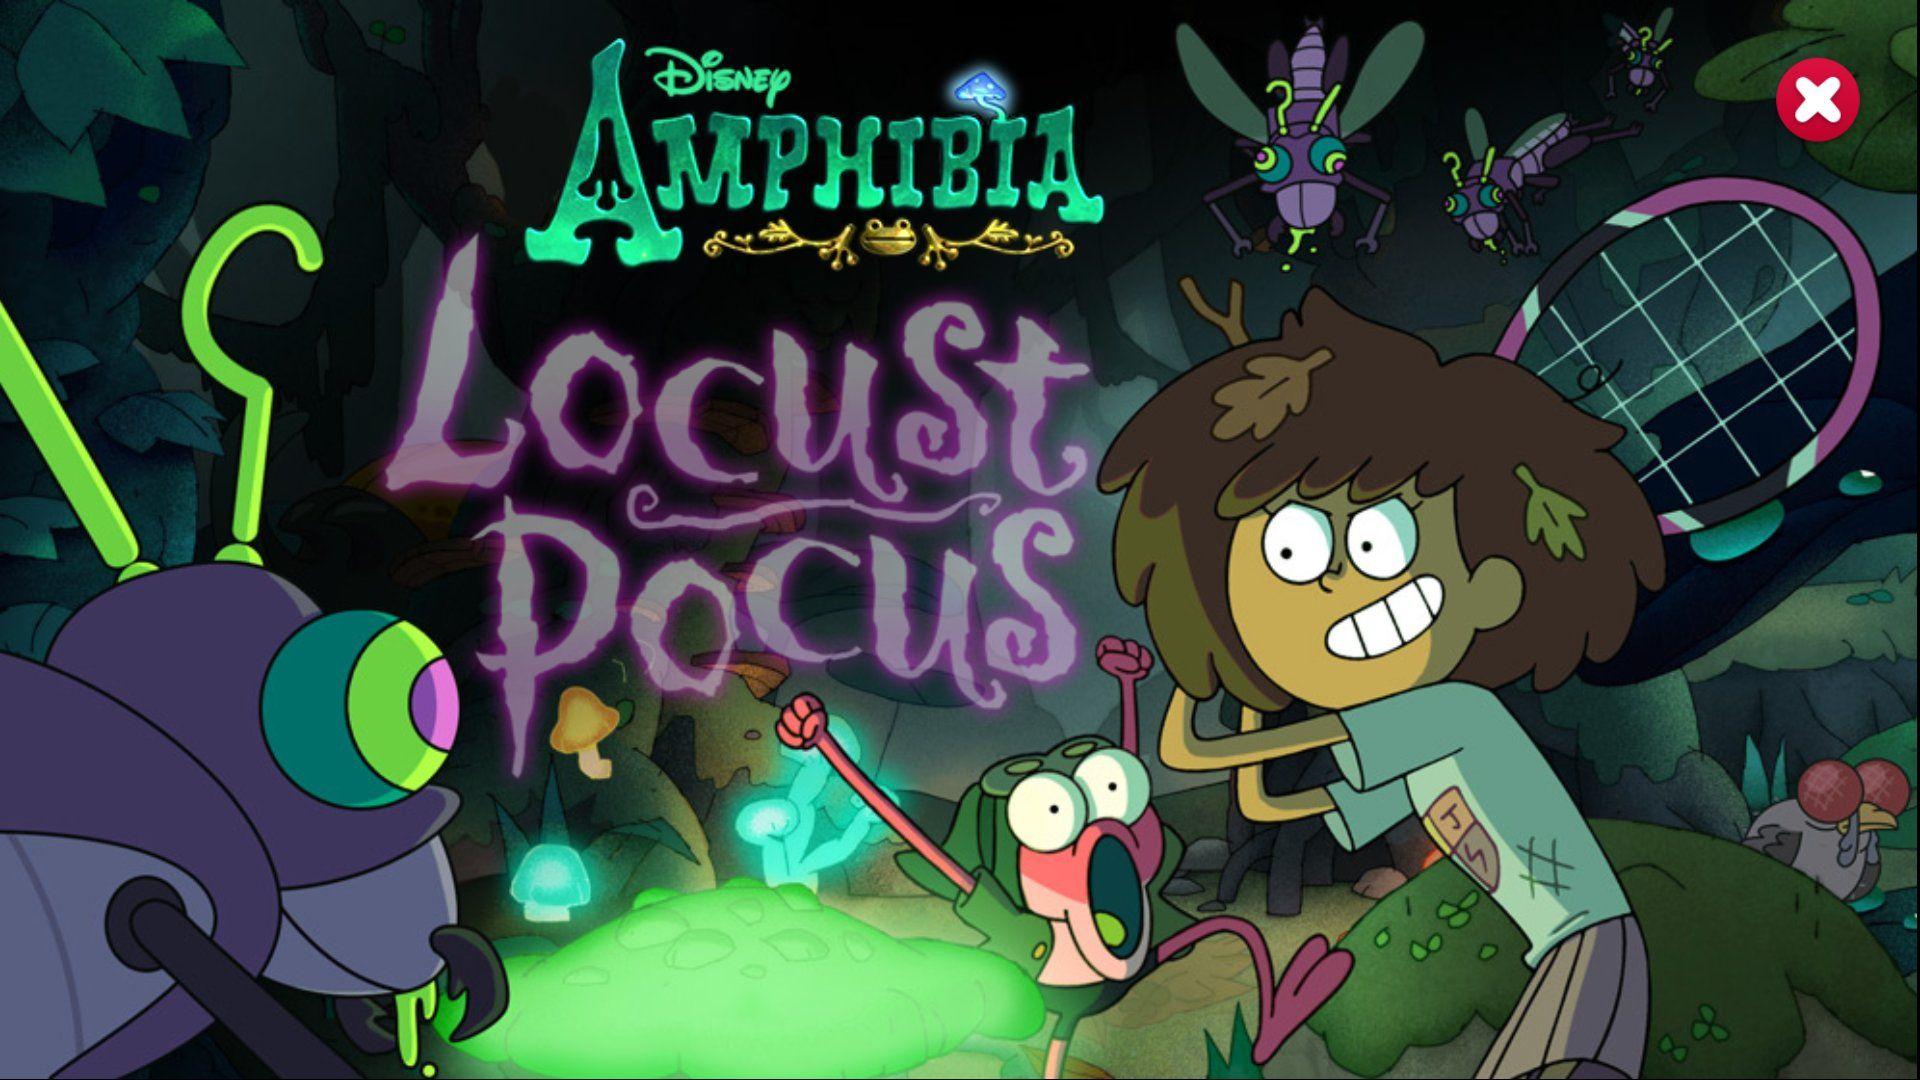 Pin by Lauren McCarthy on Amphibia Disney channel games